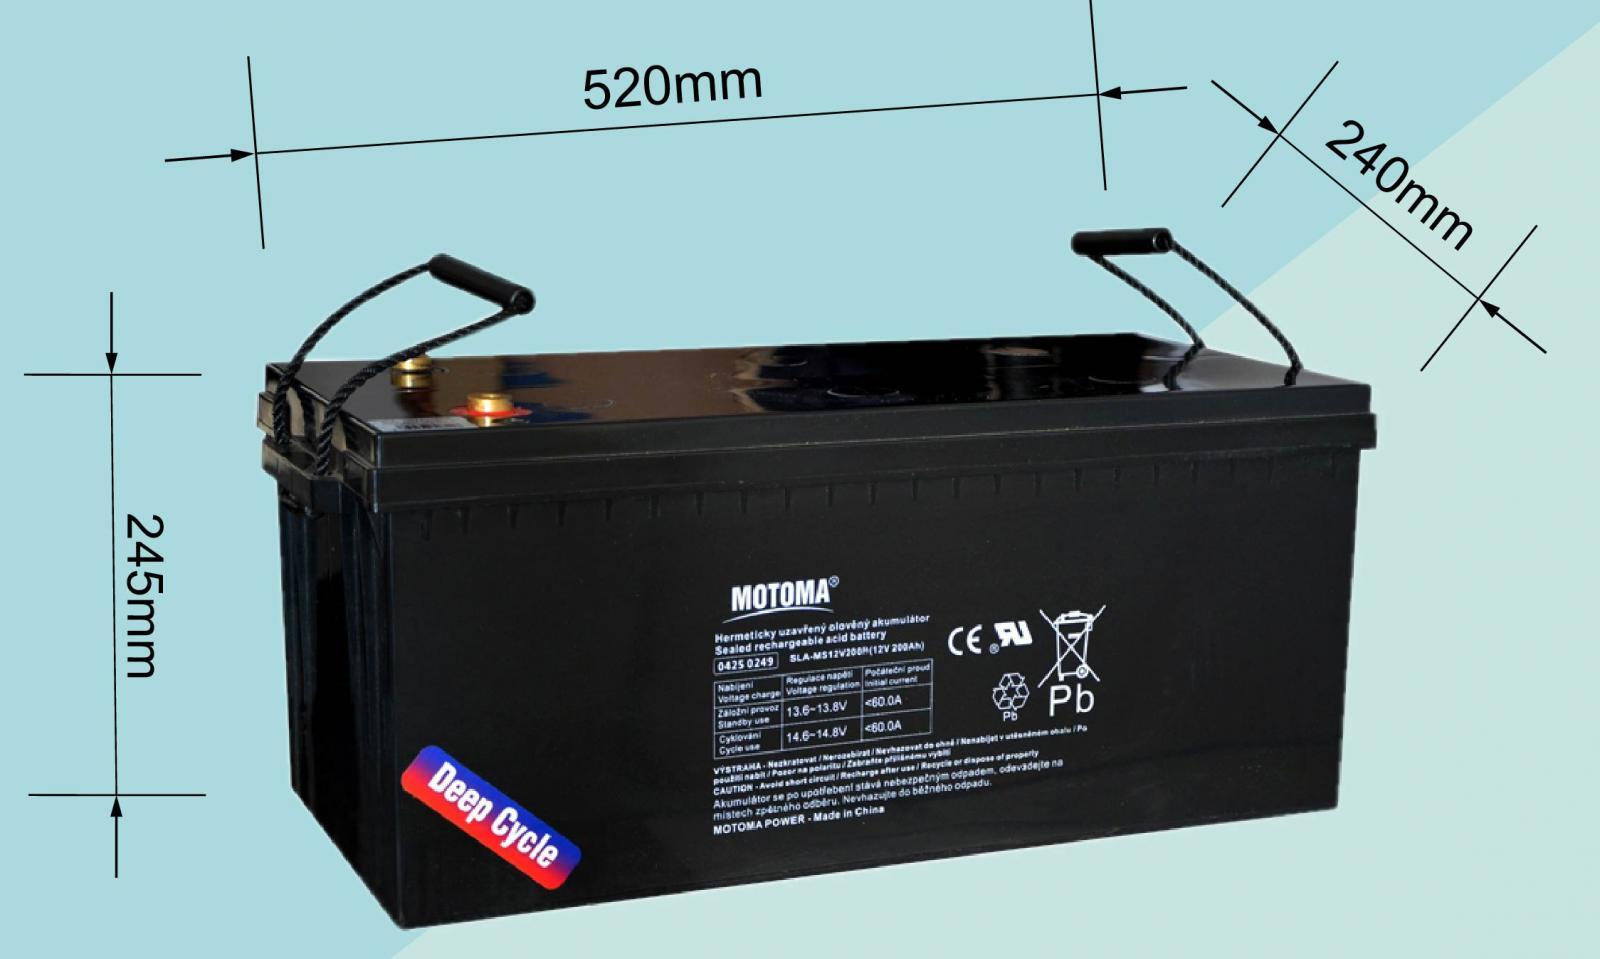 12v 200ah 205ah Gel Deep Cycle Battery Ups Marine Caravan Solar Camp 4wd